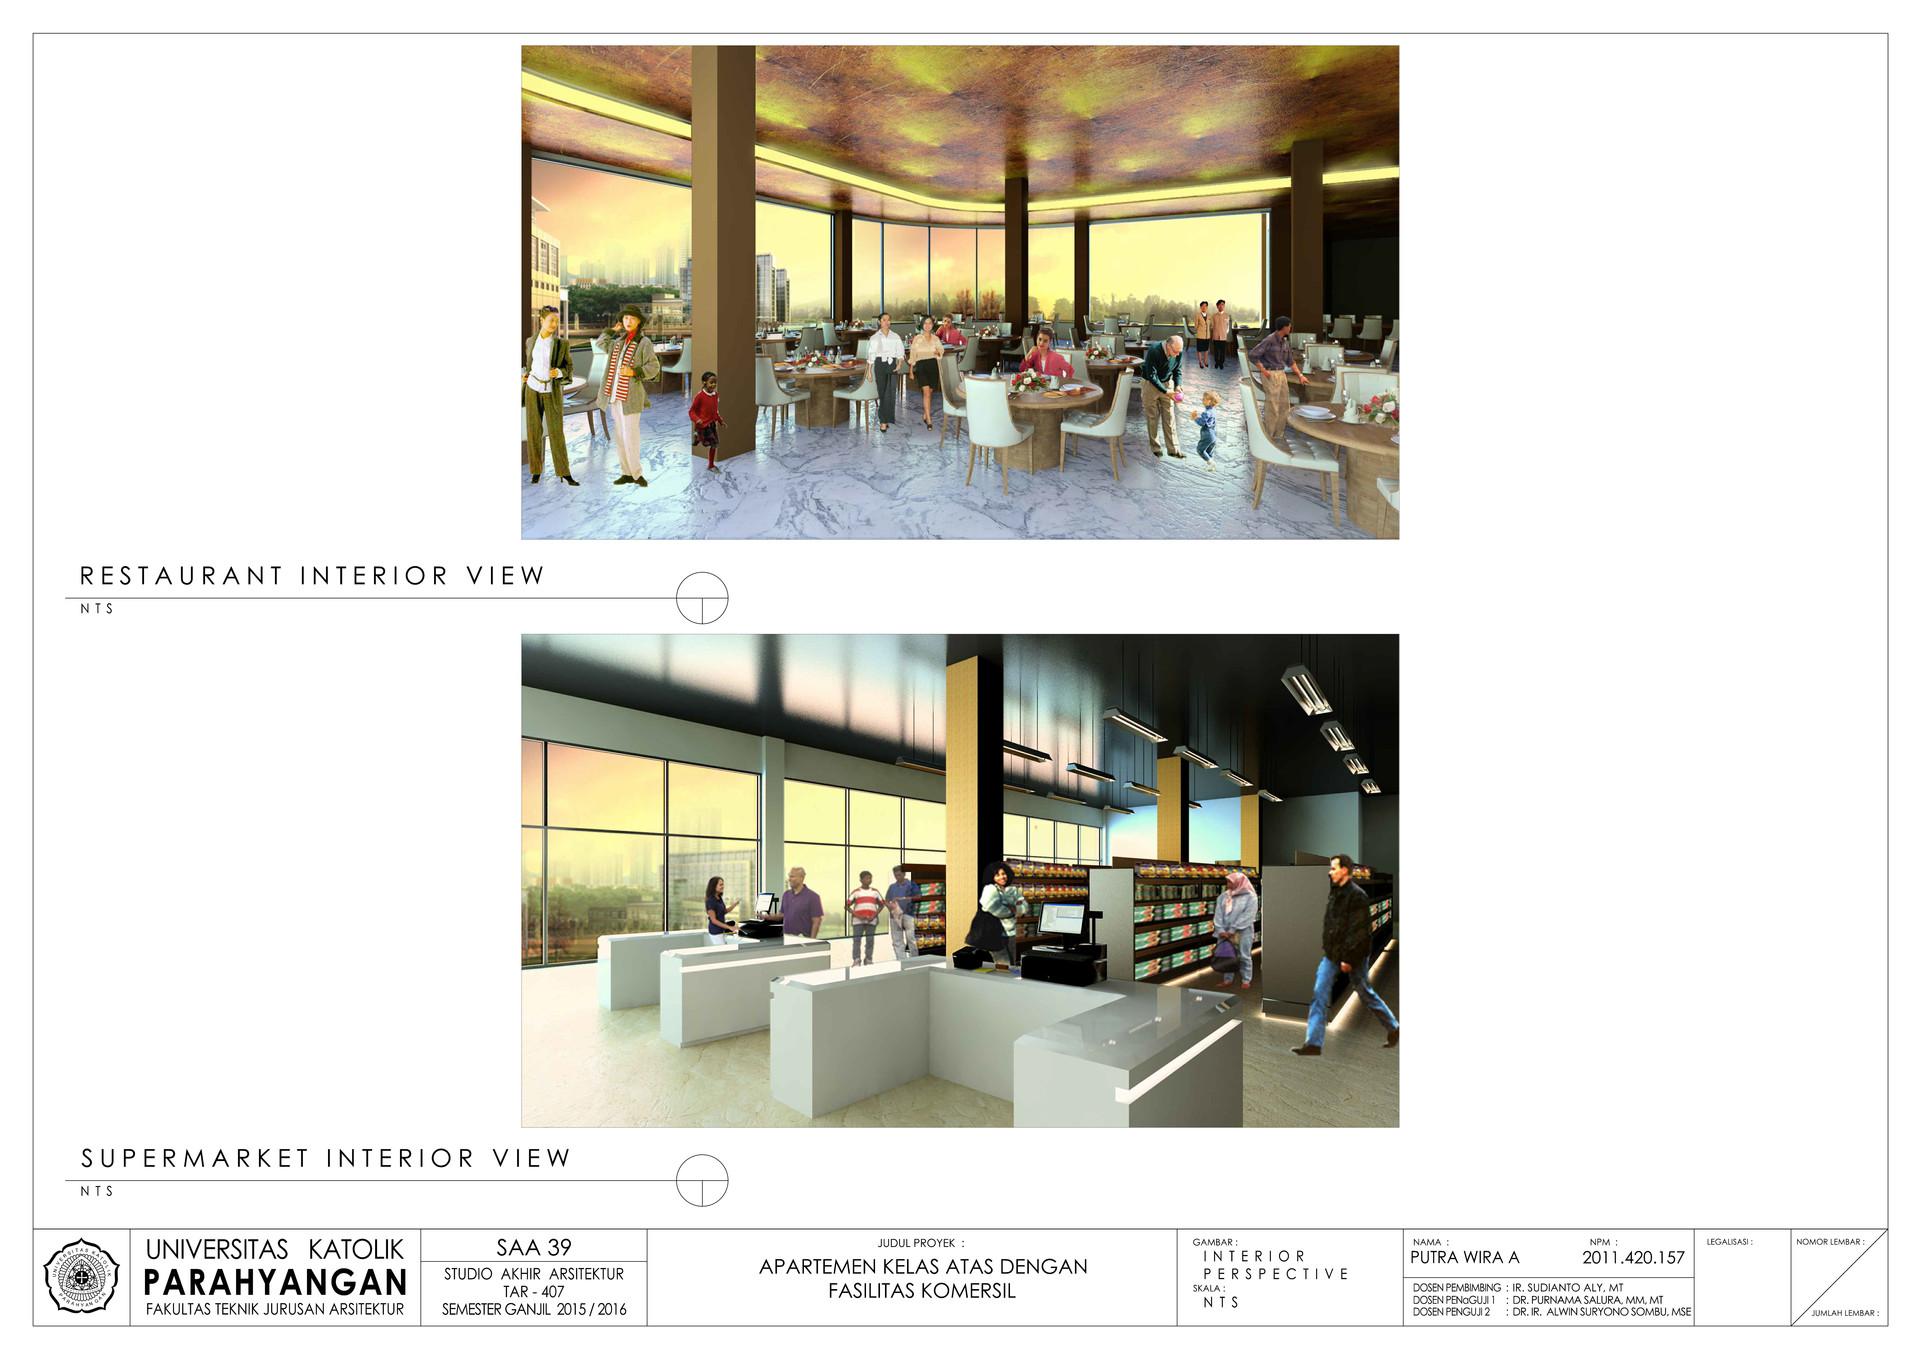 Putra wira adhiprajna 20 interior perspective